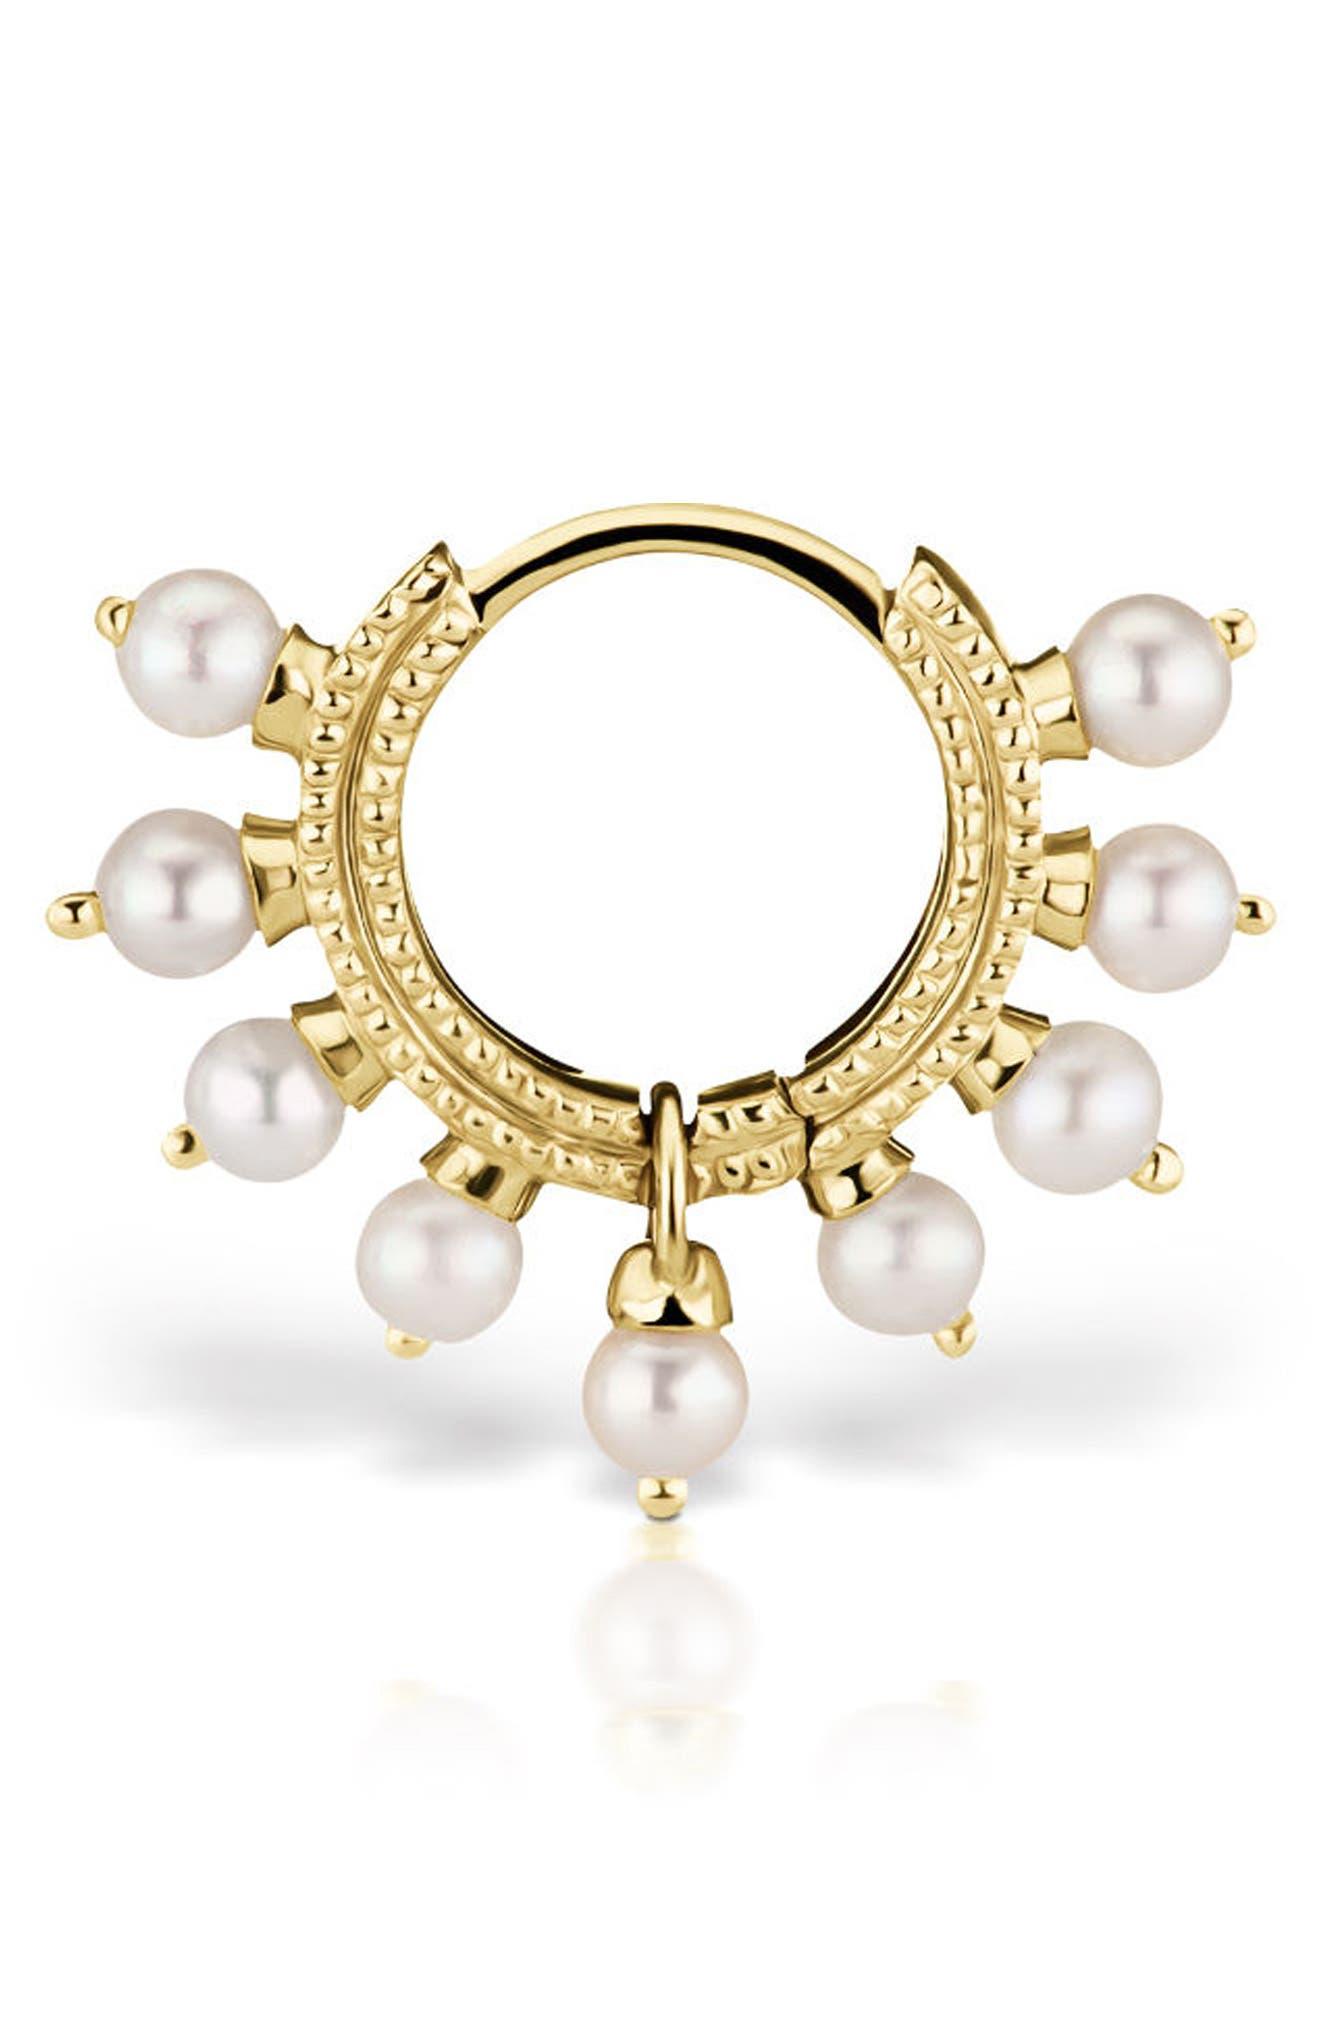 Maria Tash 18 Gauge Pearl Coronet Ring